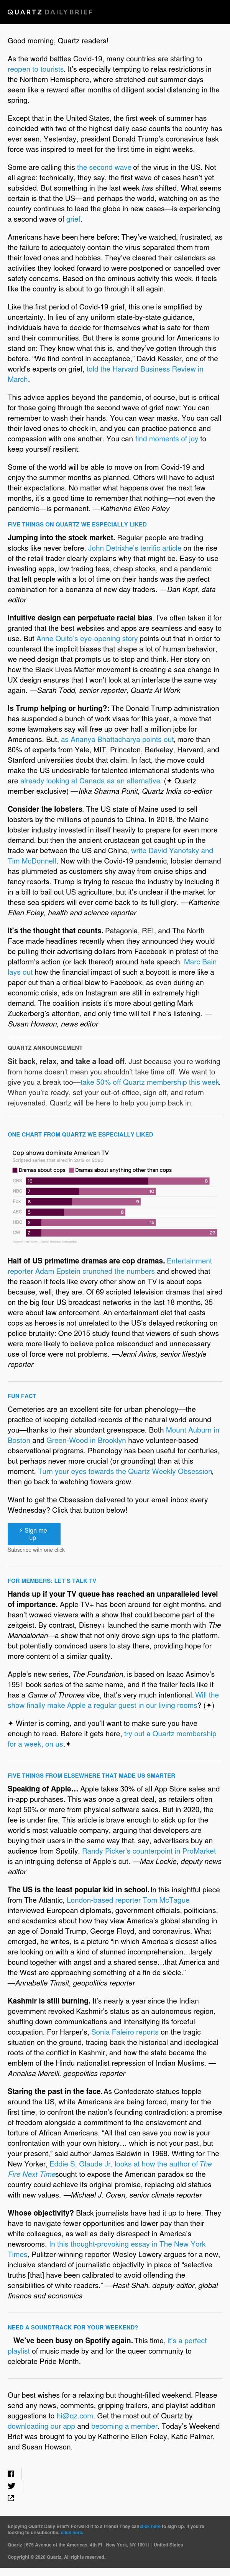 Weekend edition—Second wave of grief, unbiased design, cop dramas